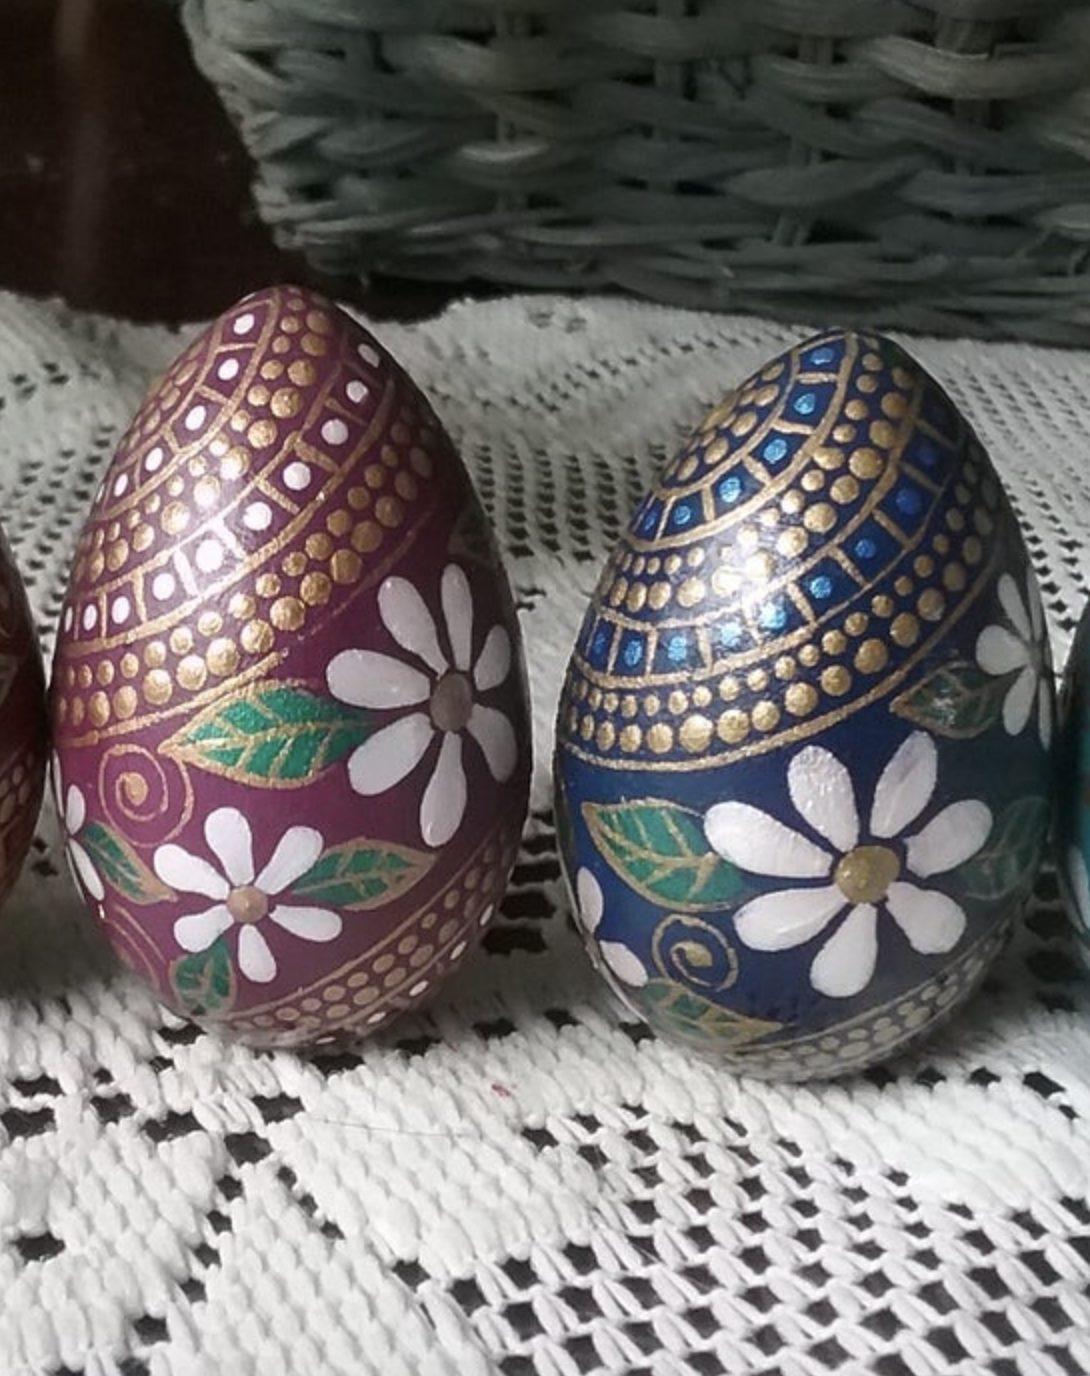 Creative painted Easter egg decor ideas